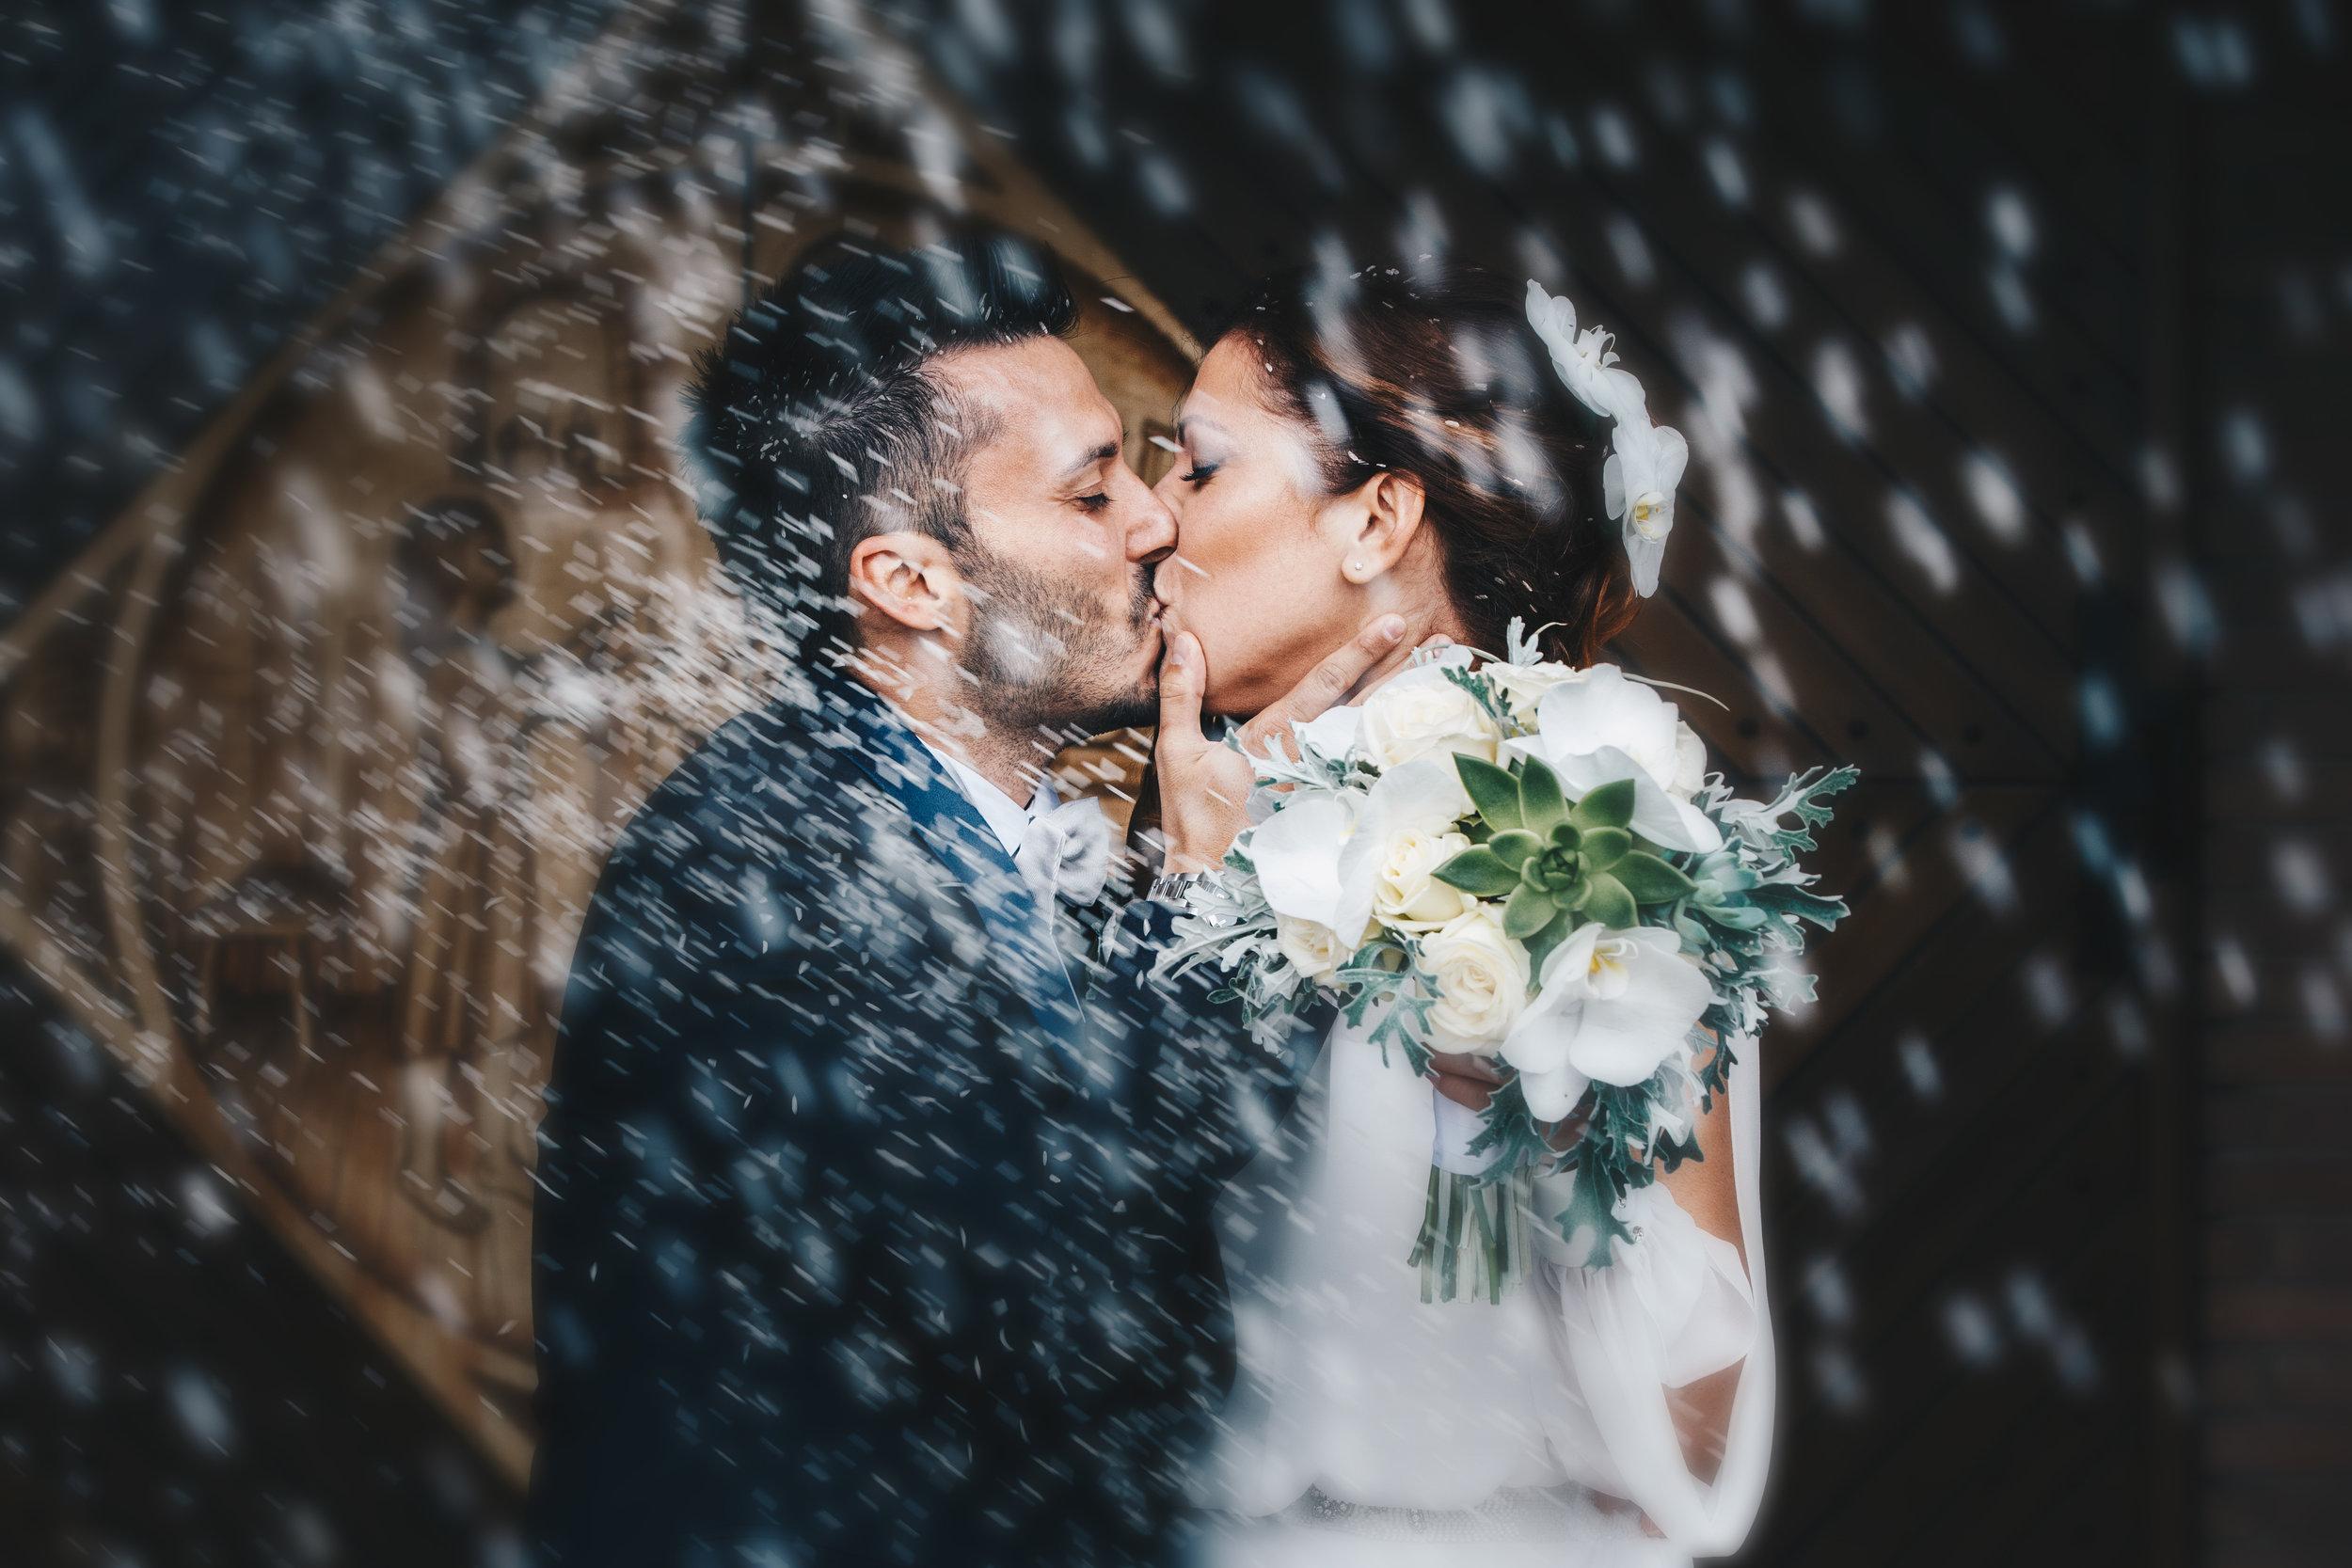 stefano-torreggiani-fotografo-matrimonio (2).jpg